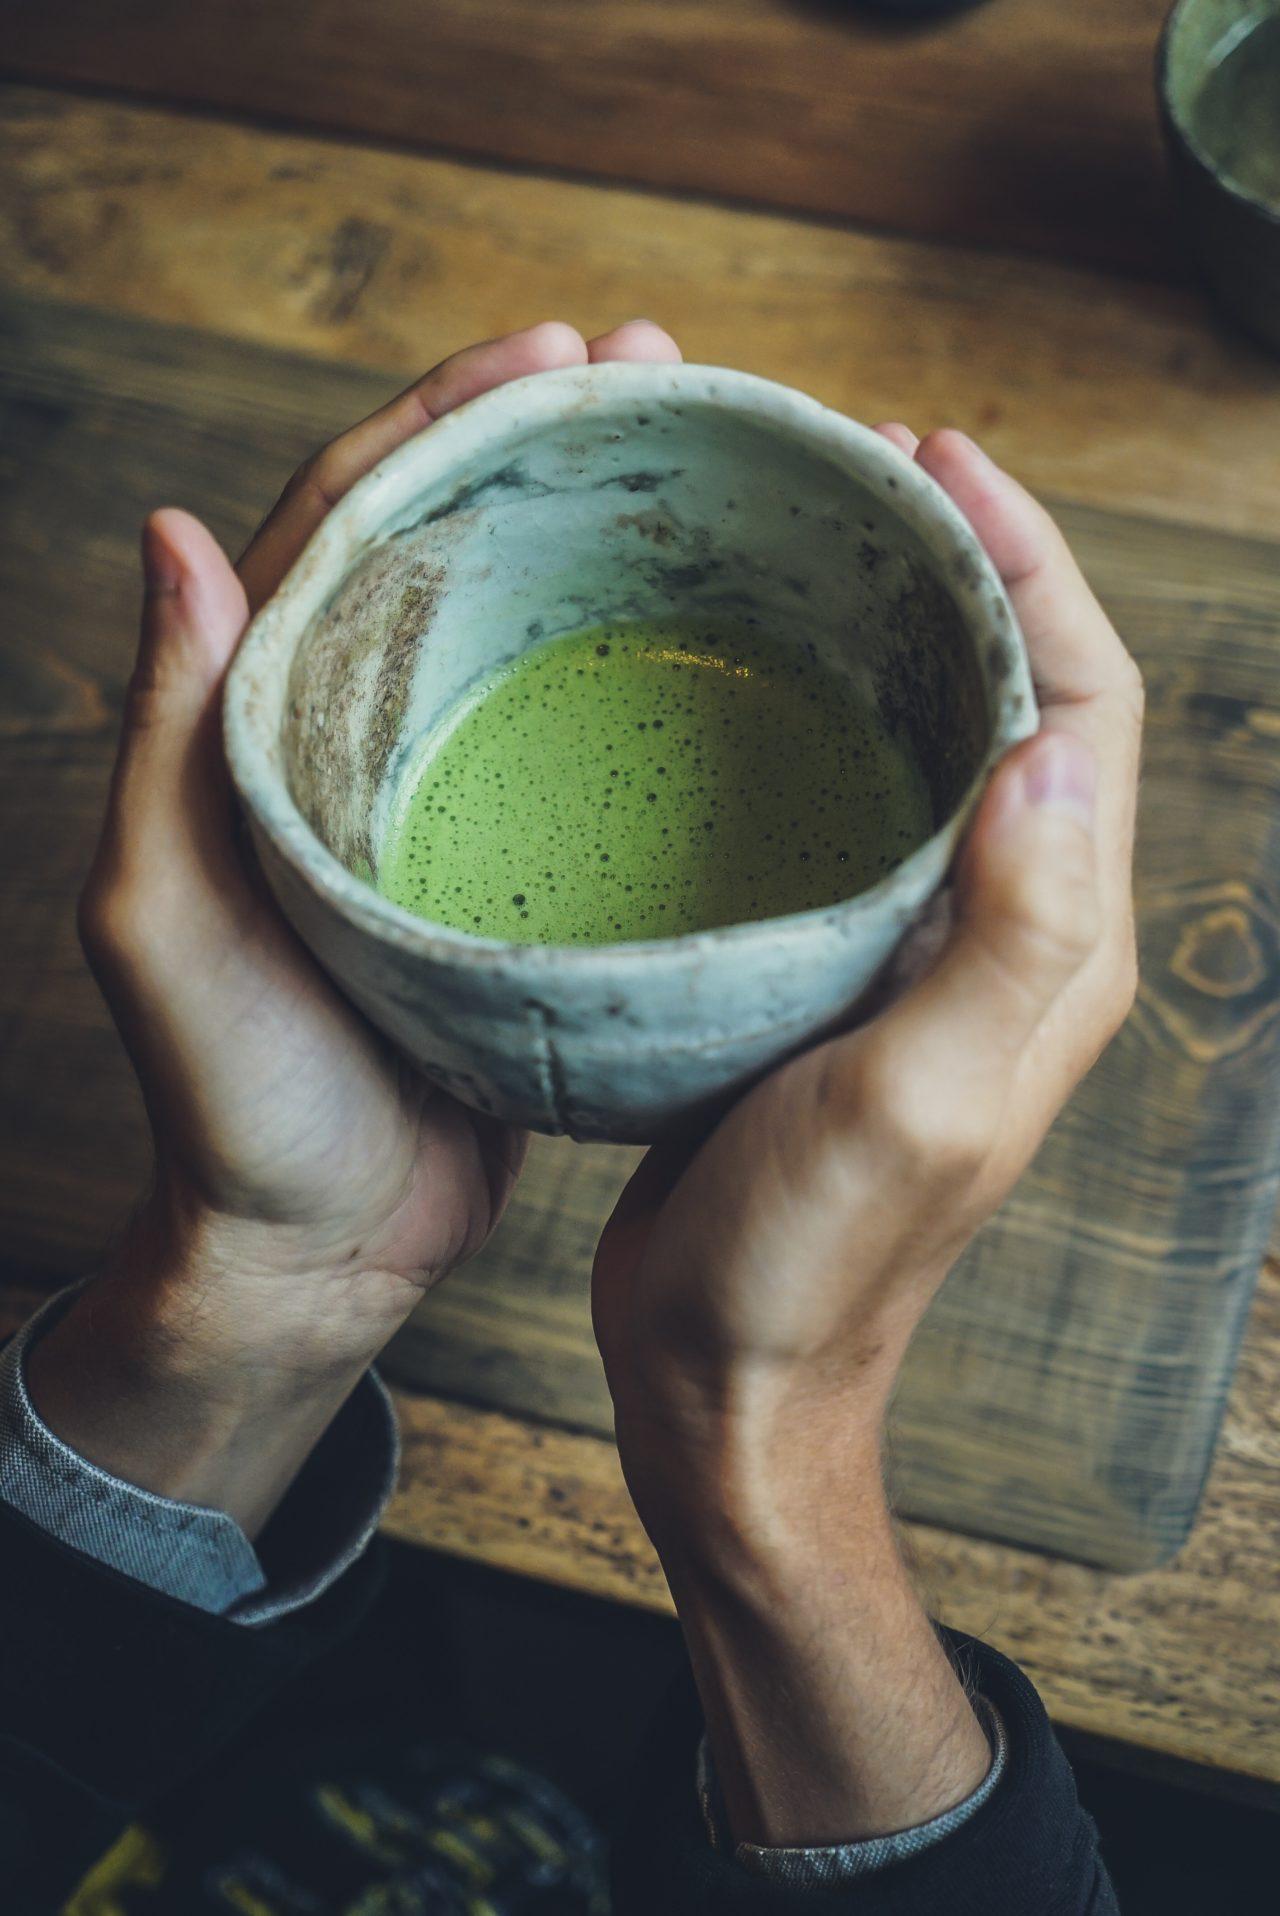 5 Ways Food & Beverage Entrepreneurs Can Make Mental Health a Priority